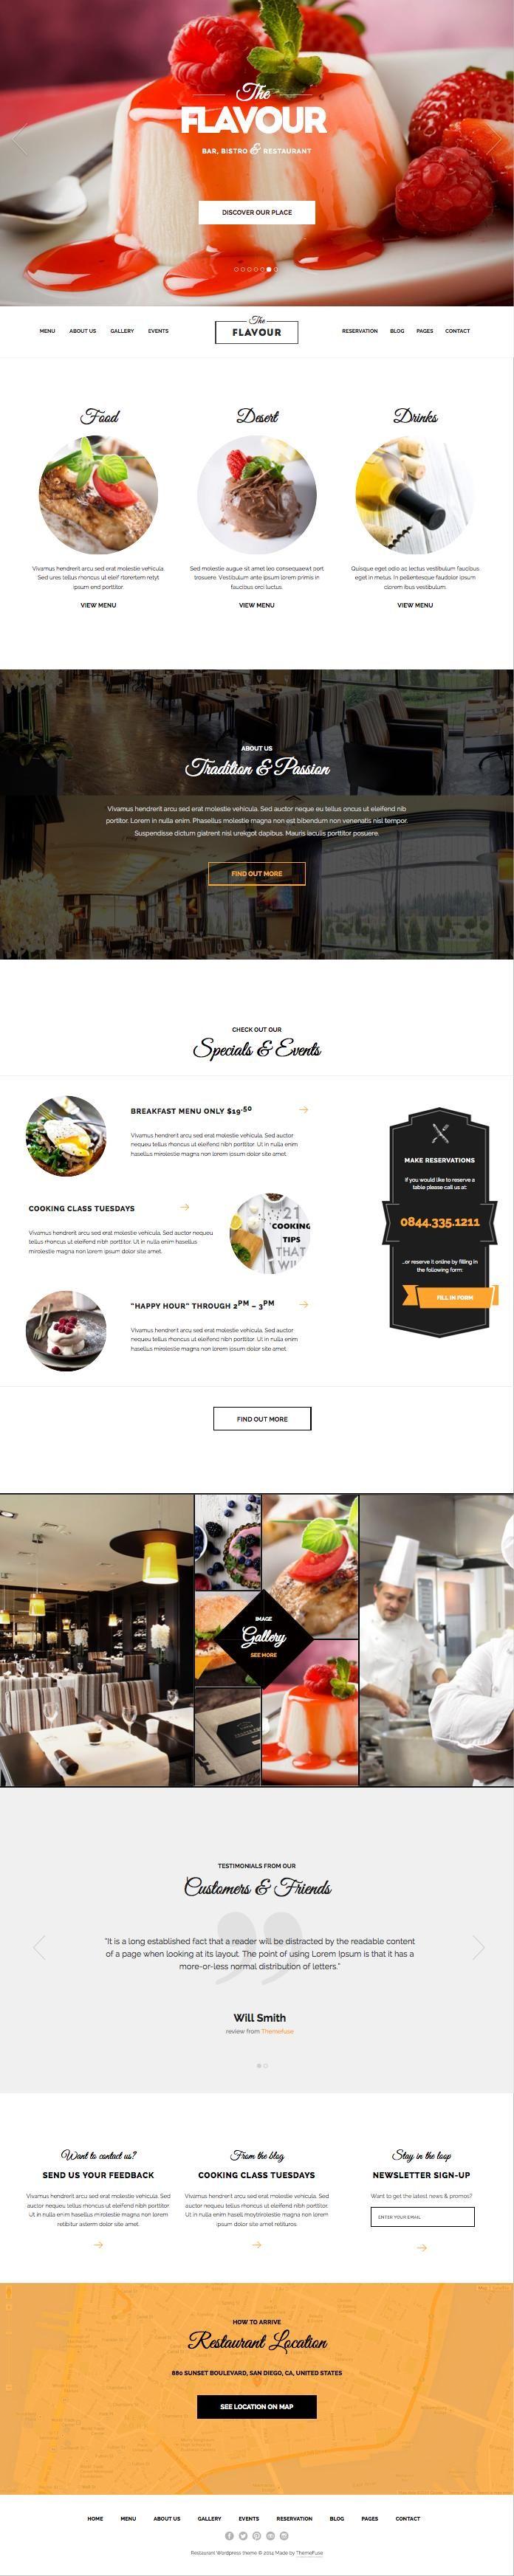 The Flavour WordPress Modern Restaurant Theme | repinned by www.altergrafix.be